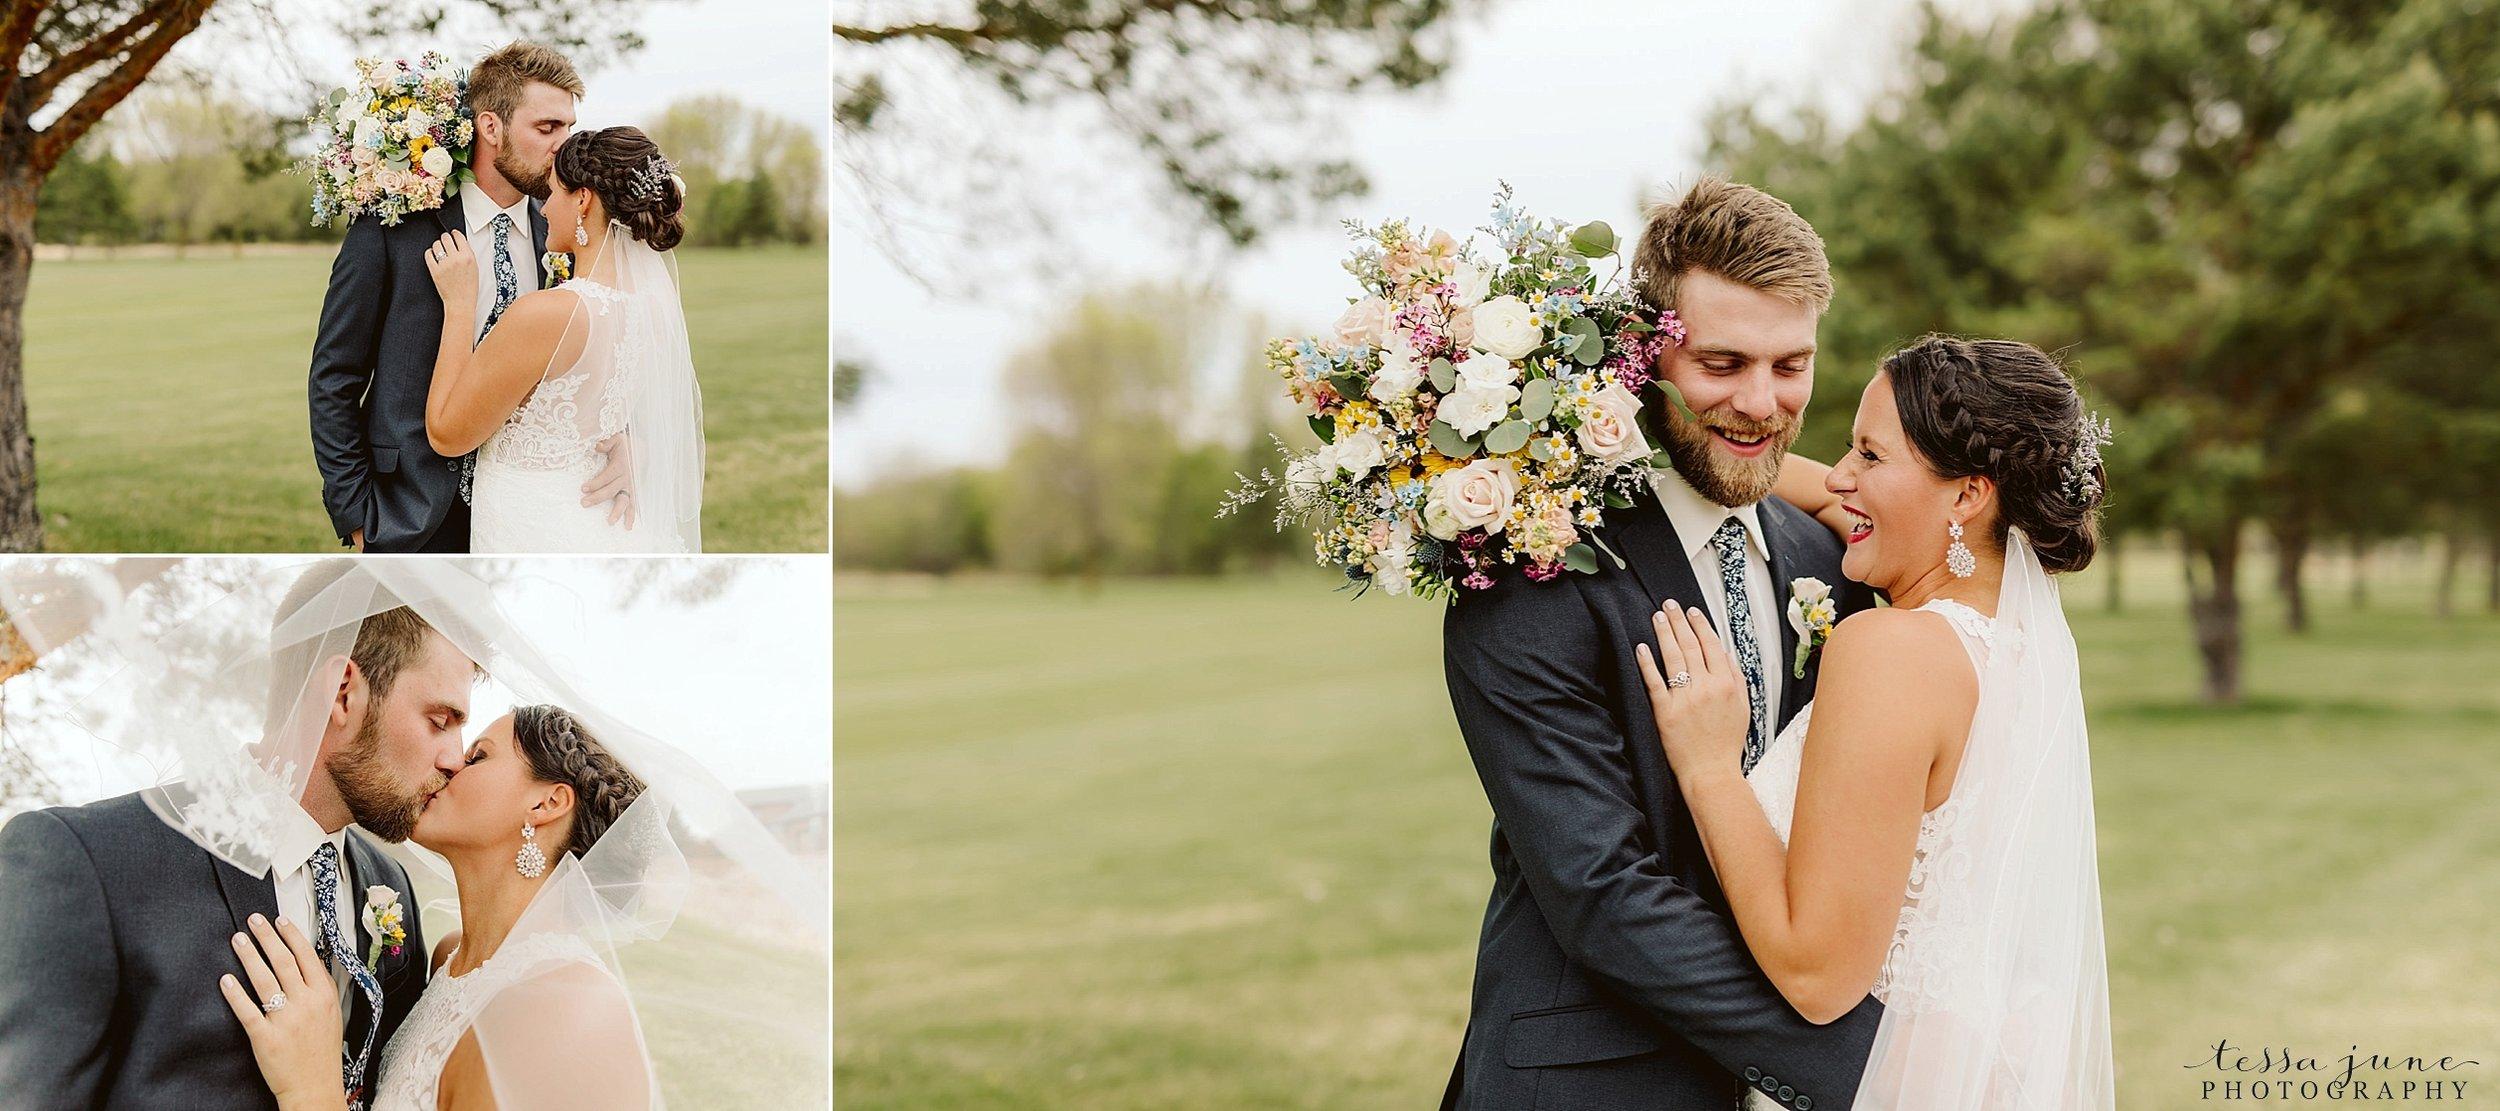 The-grands-at-mulligans-wedding-sartell-minnesota-spring-floral-spring-garden-wedding-59.jpg